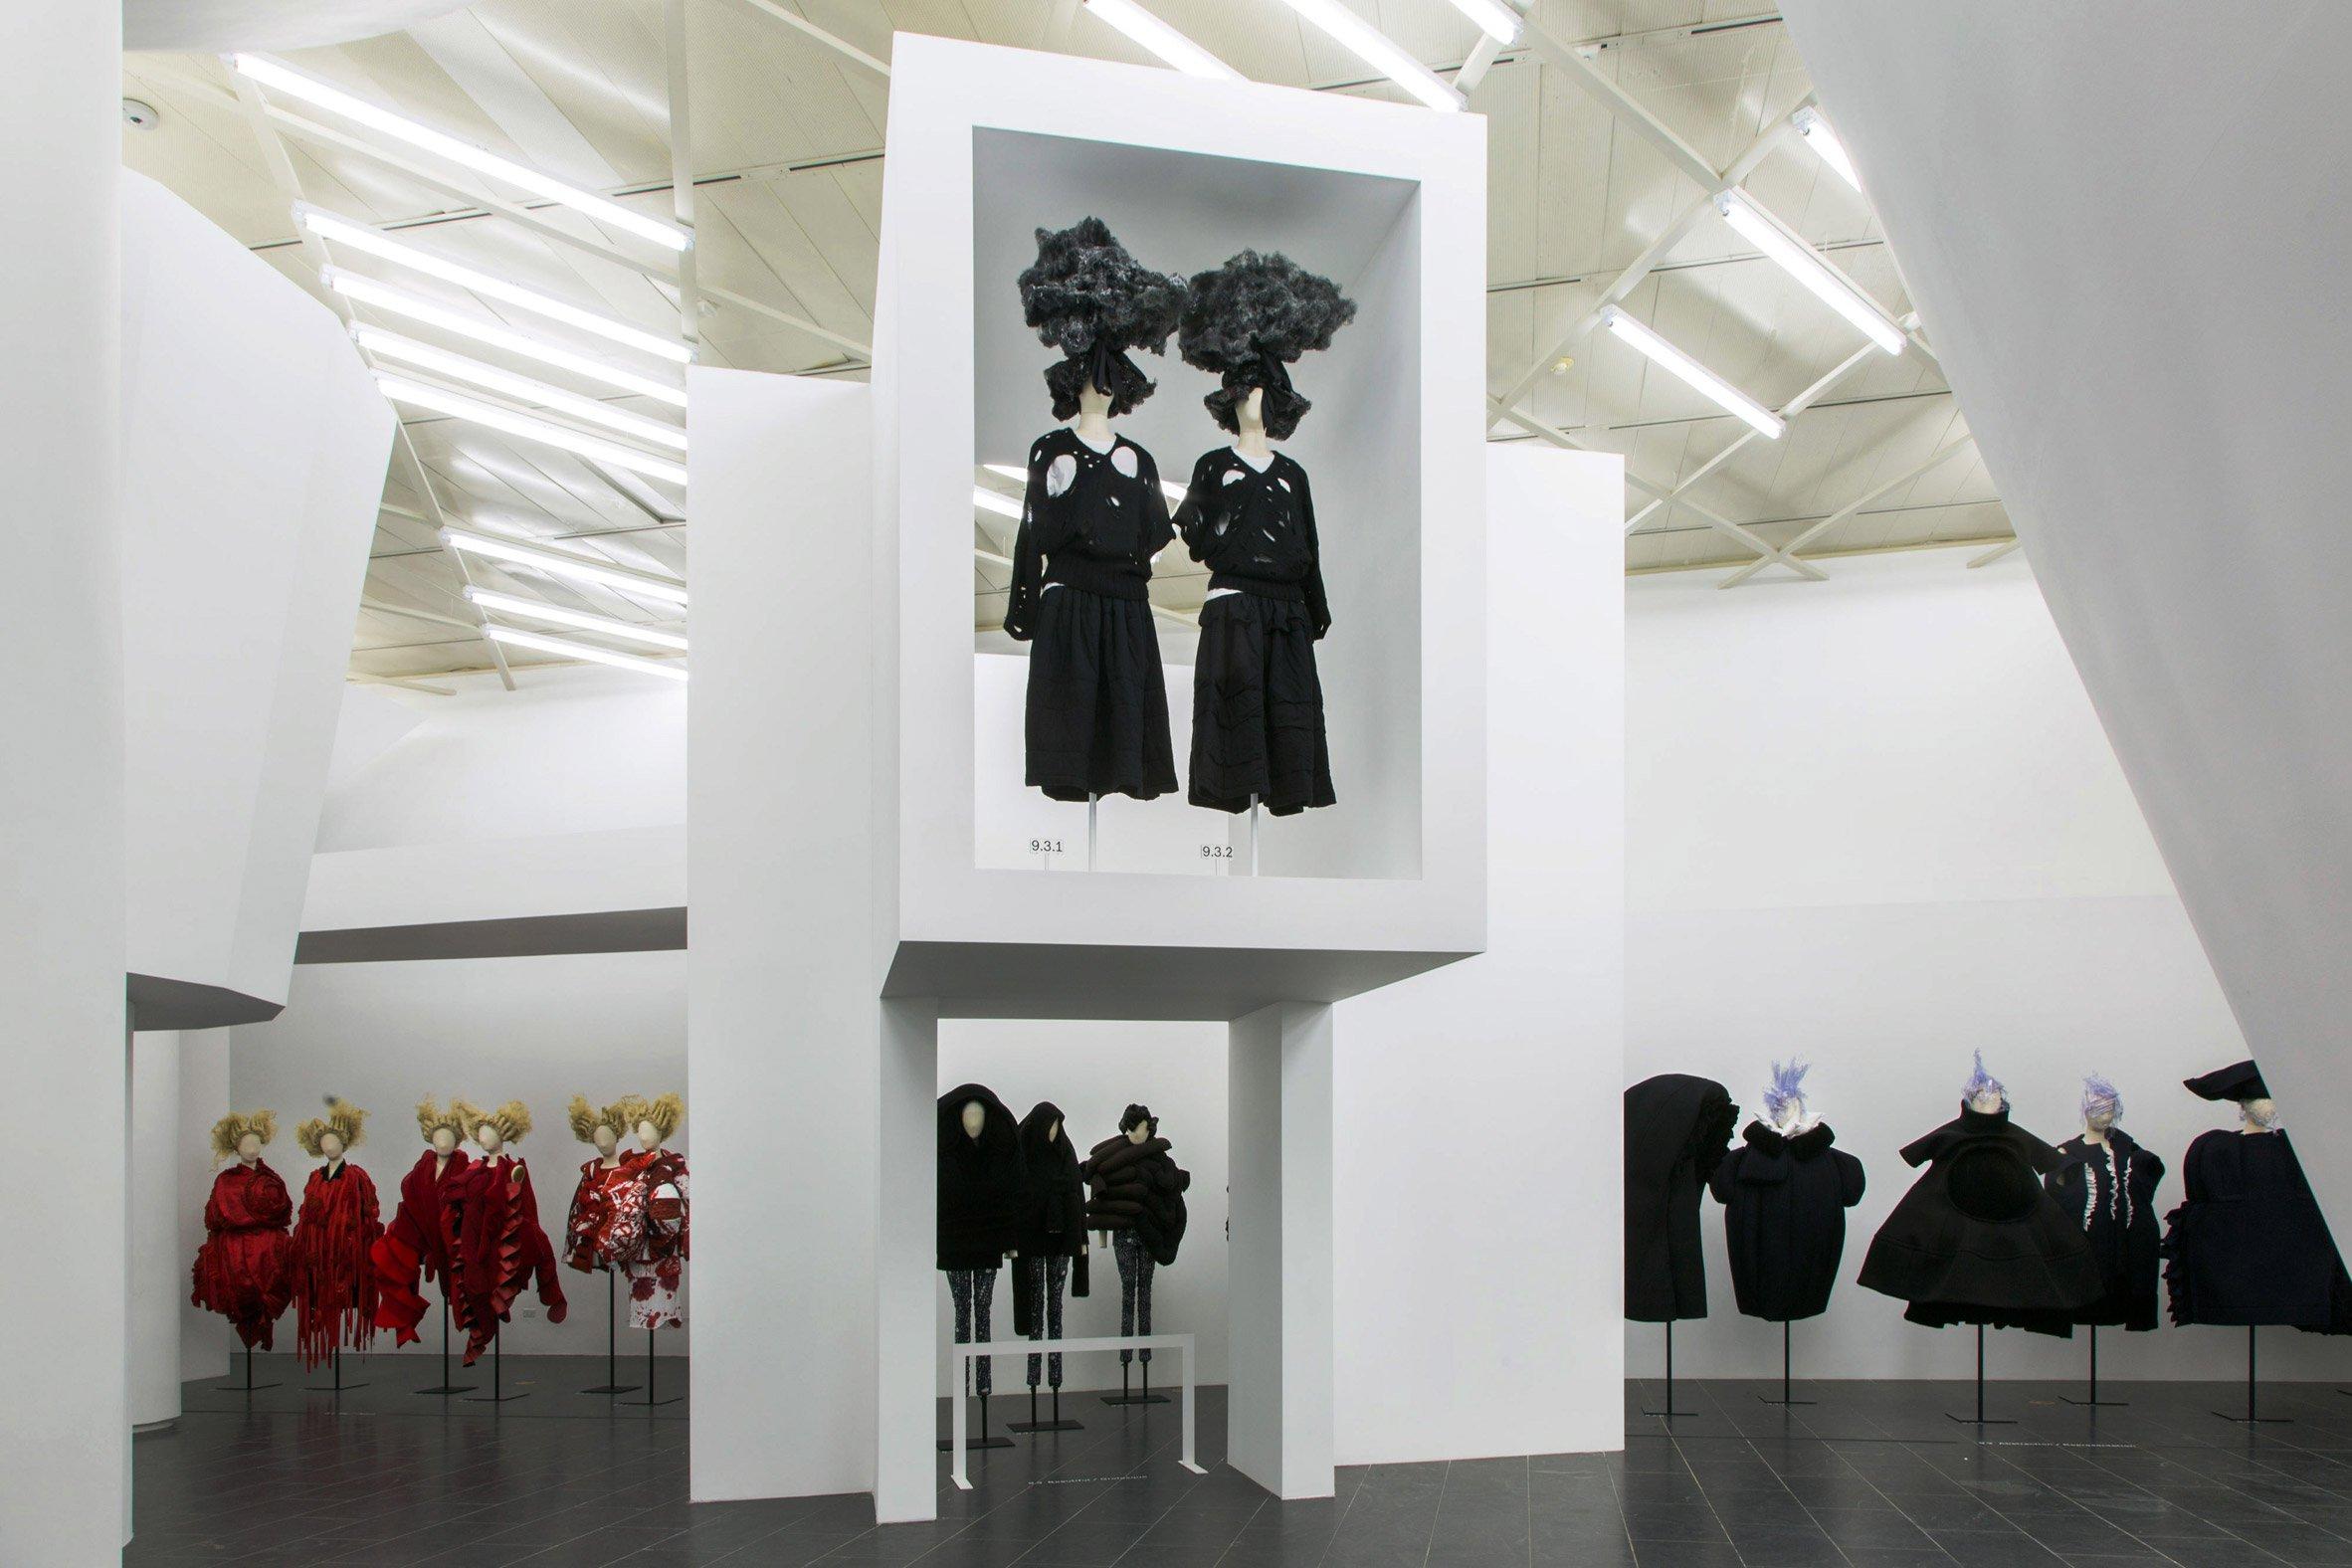 comme-des-garcons-in-between-rei-kawakubo-monograph-fashion-costume-institute-spring-exhibition-metropolitan-museum-art-new-york-usa_dezeen_21.jpg